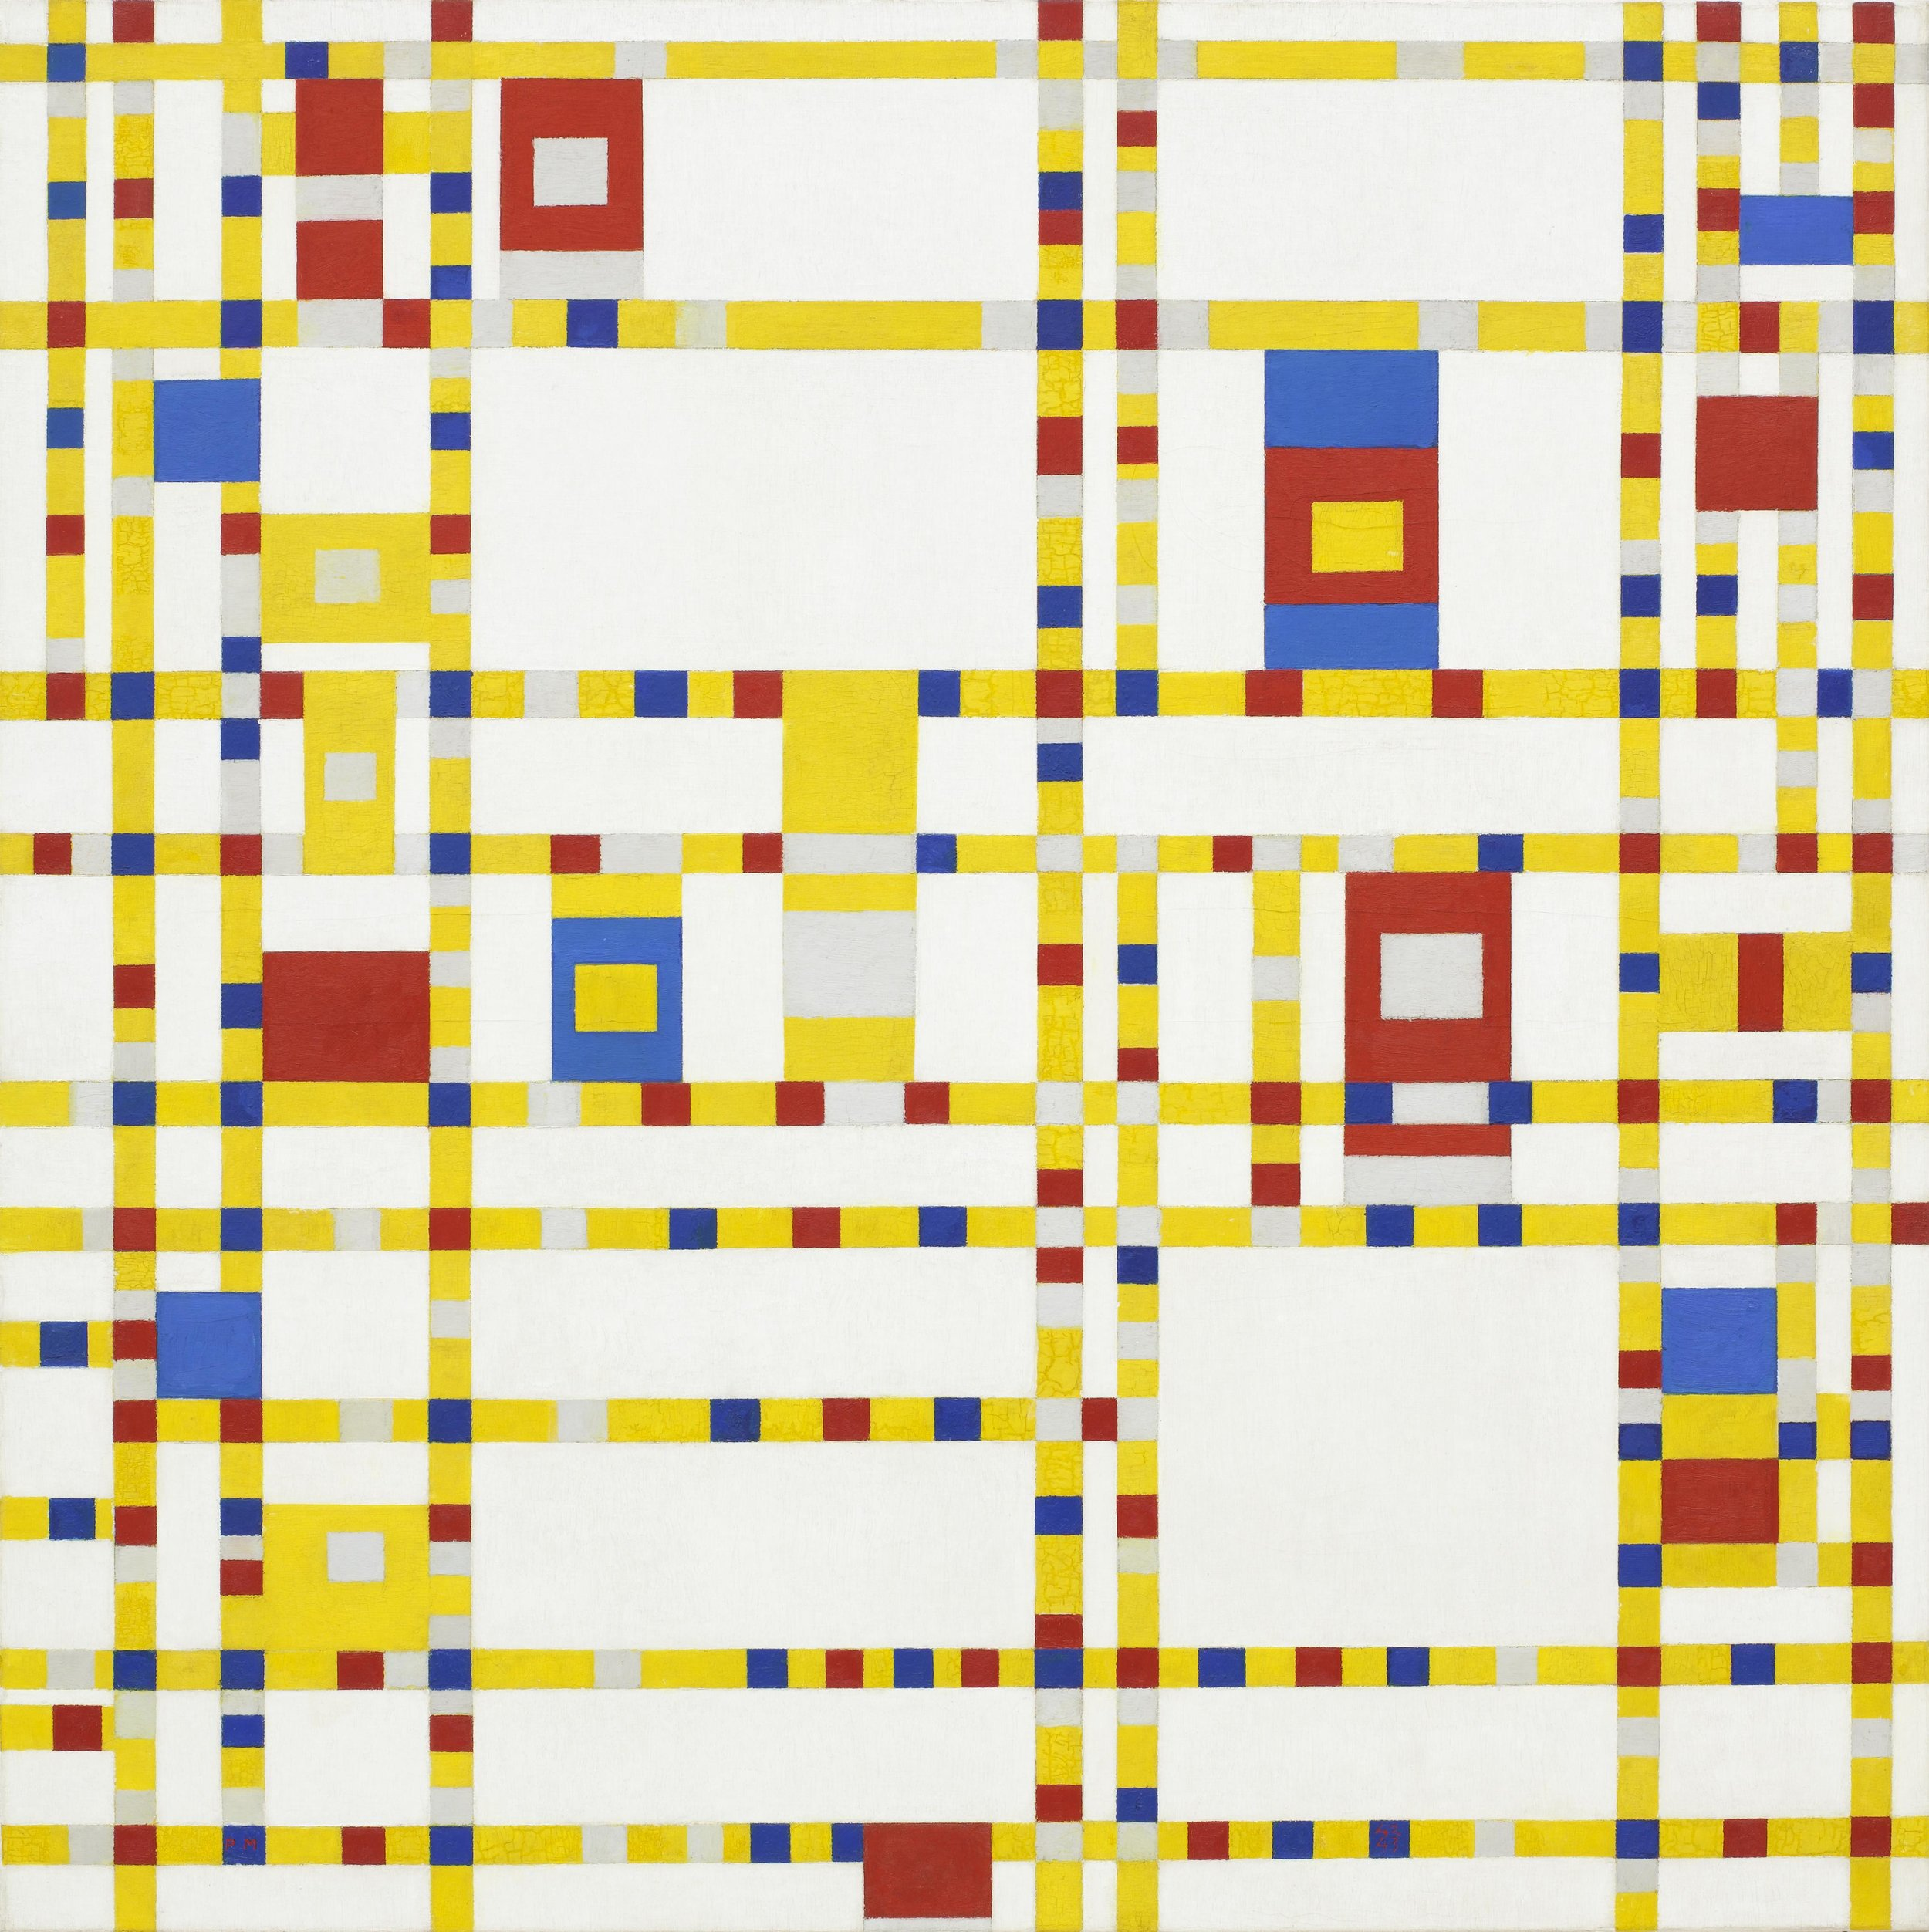 Piet Mondrian, Broadway Boogie Woogie, 1943. Courtesy Wikipedia Commons